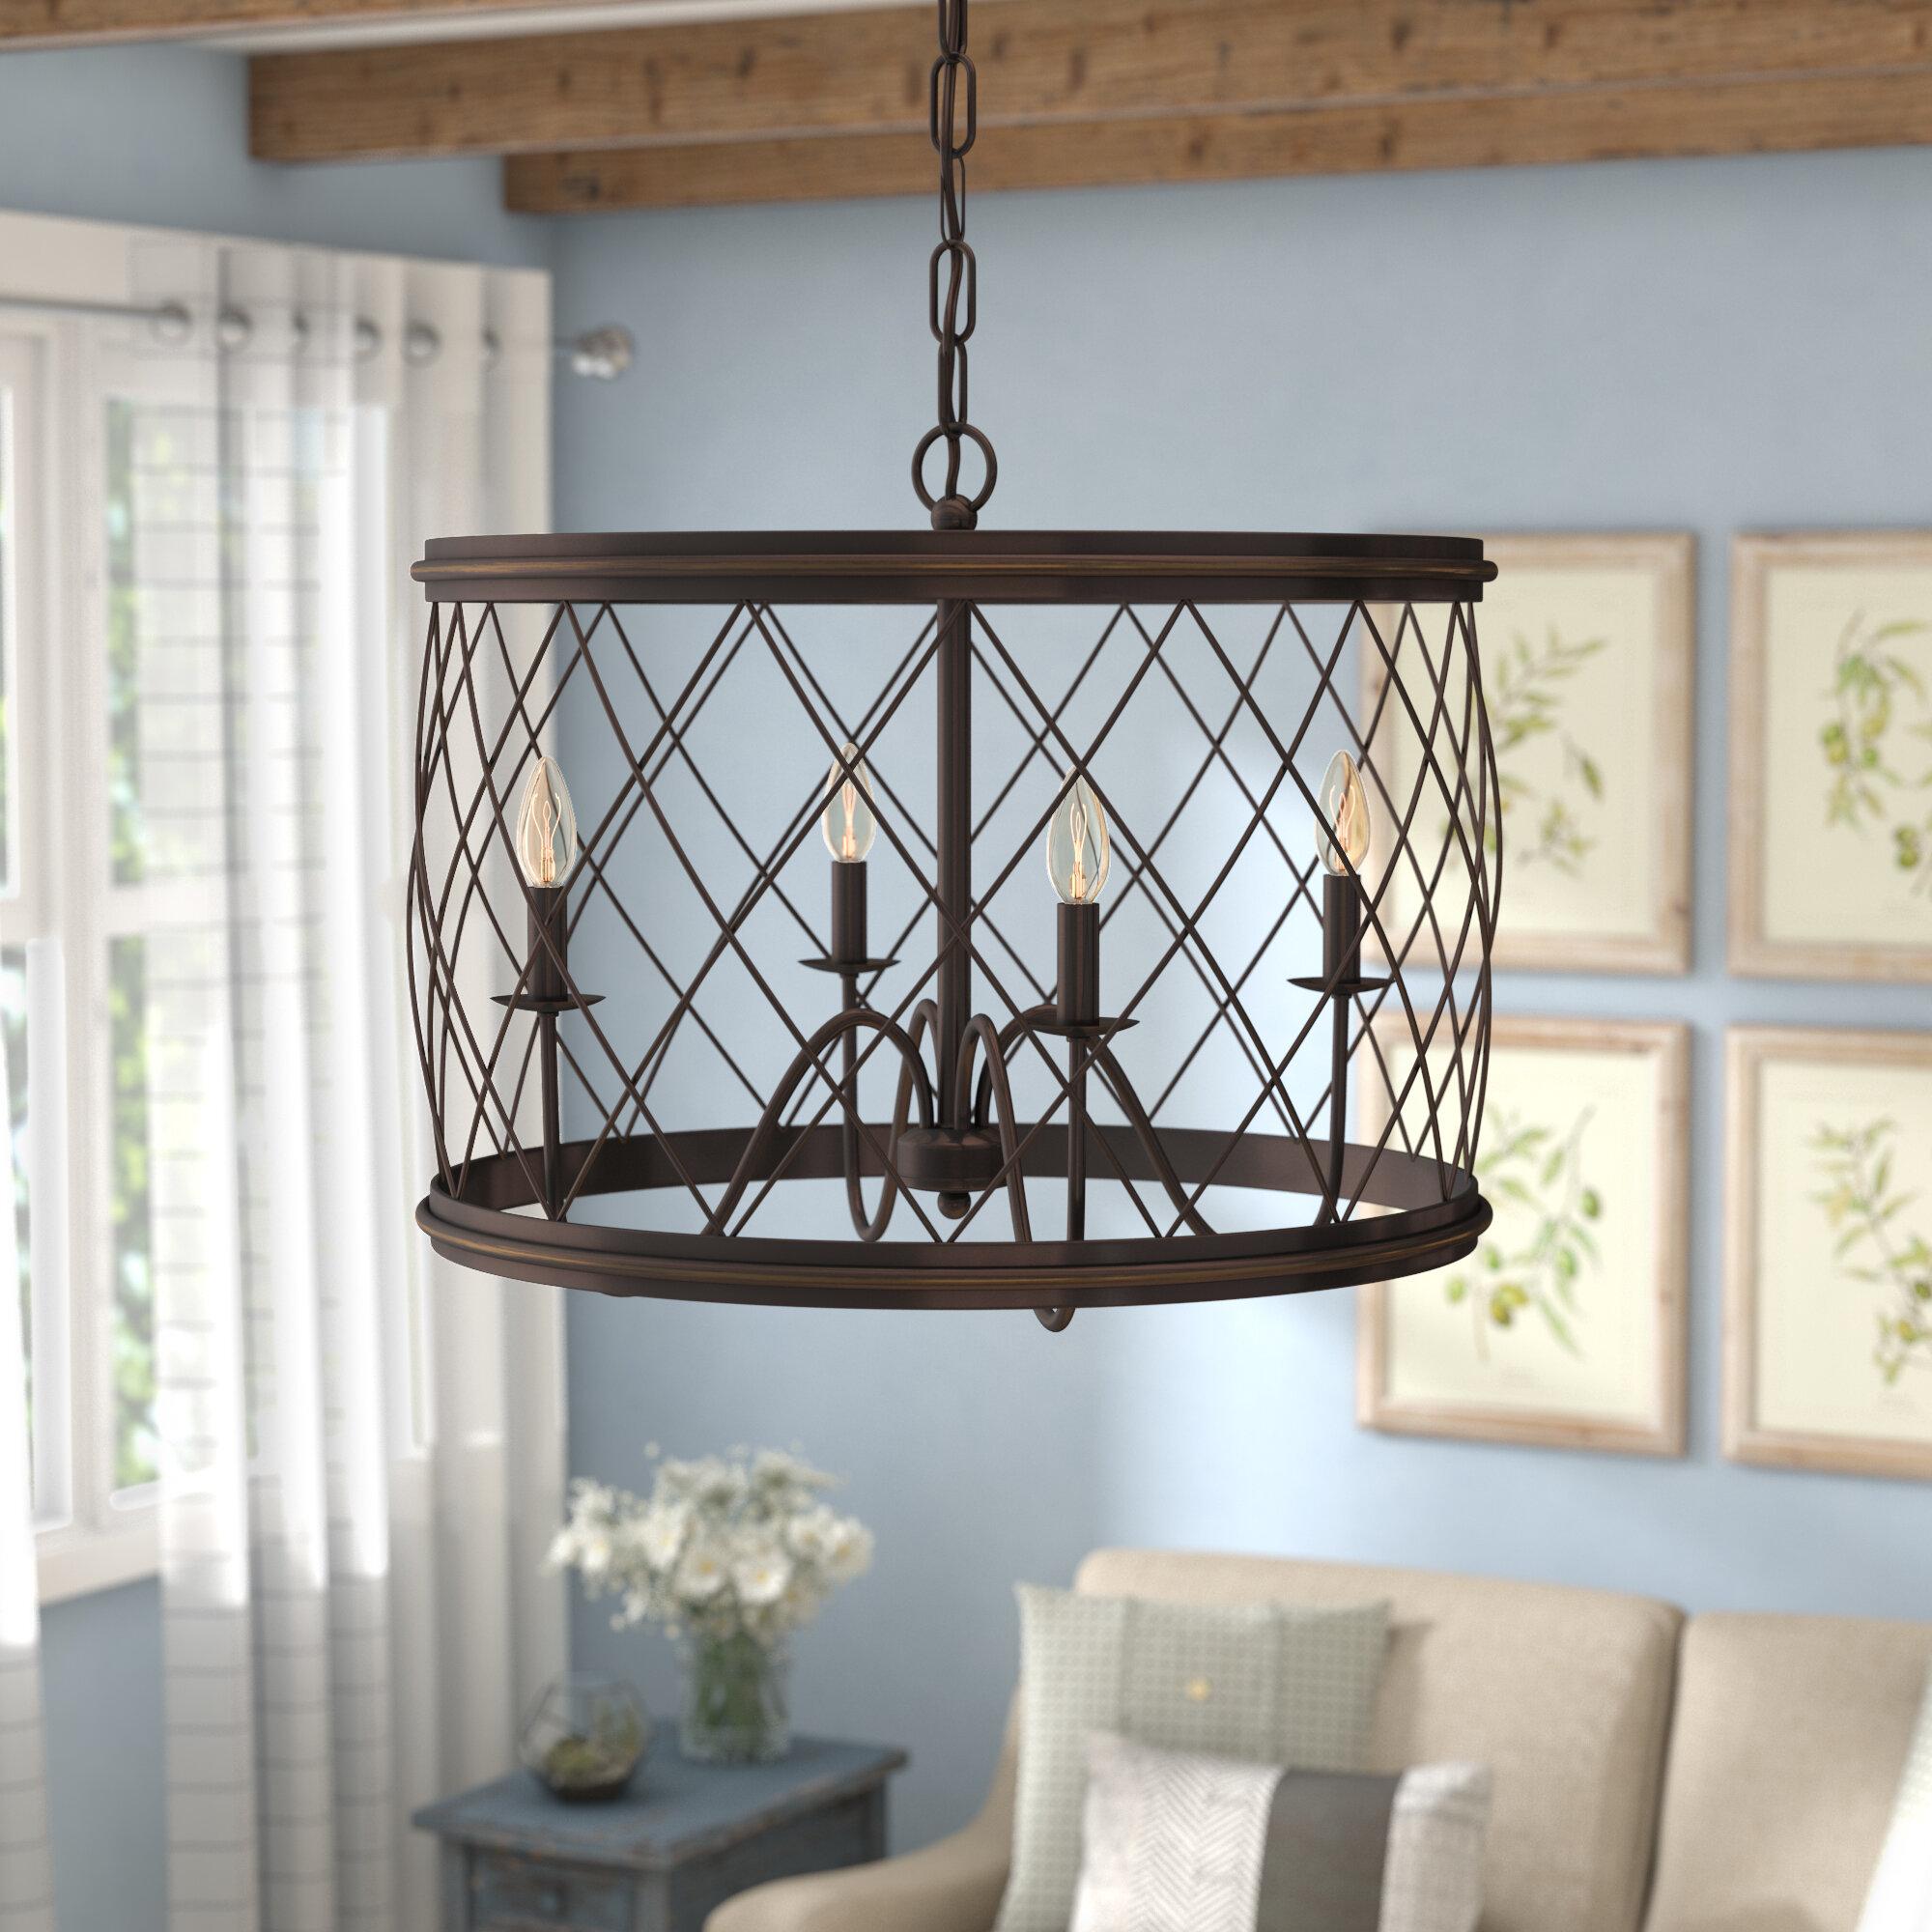 Laurel Foundry Modern Farmhouse Gabriel 4-Light Pendant & Reviews ...